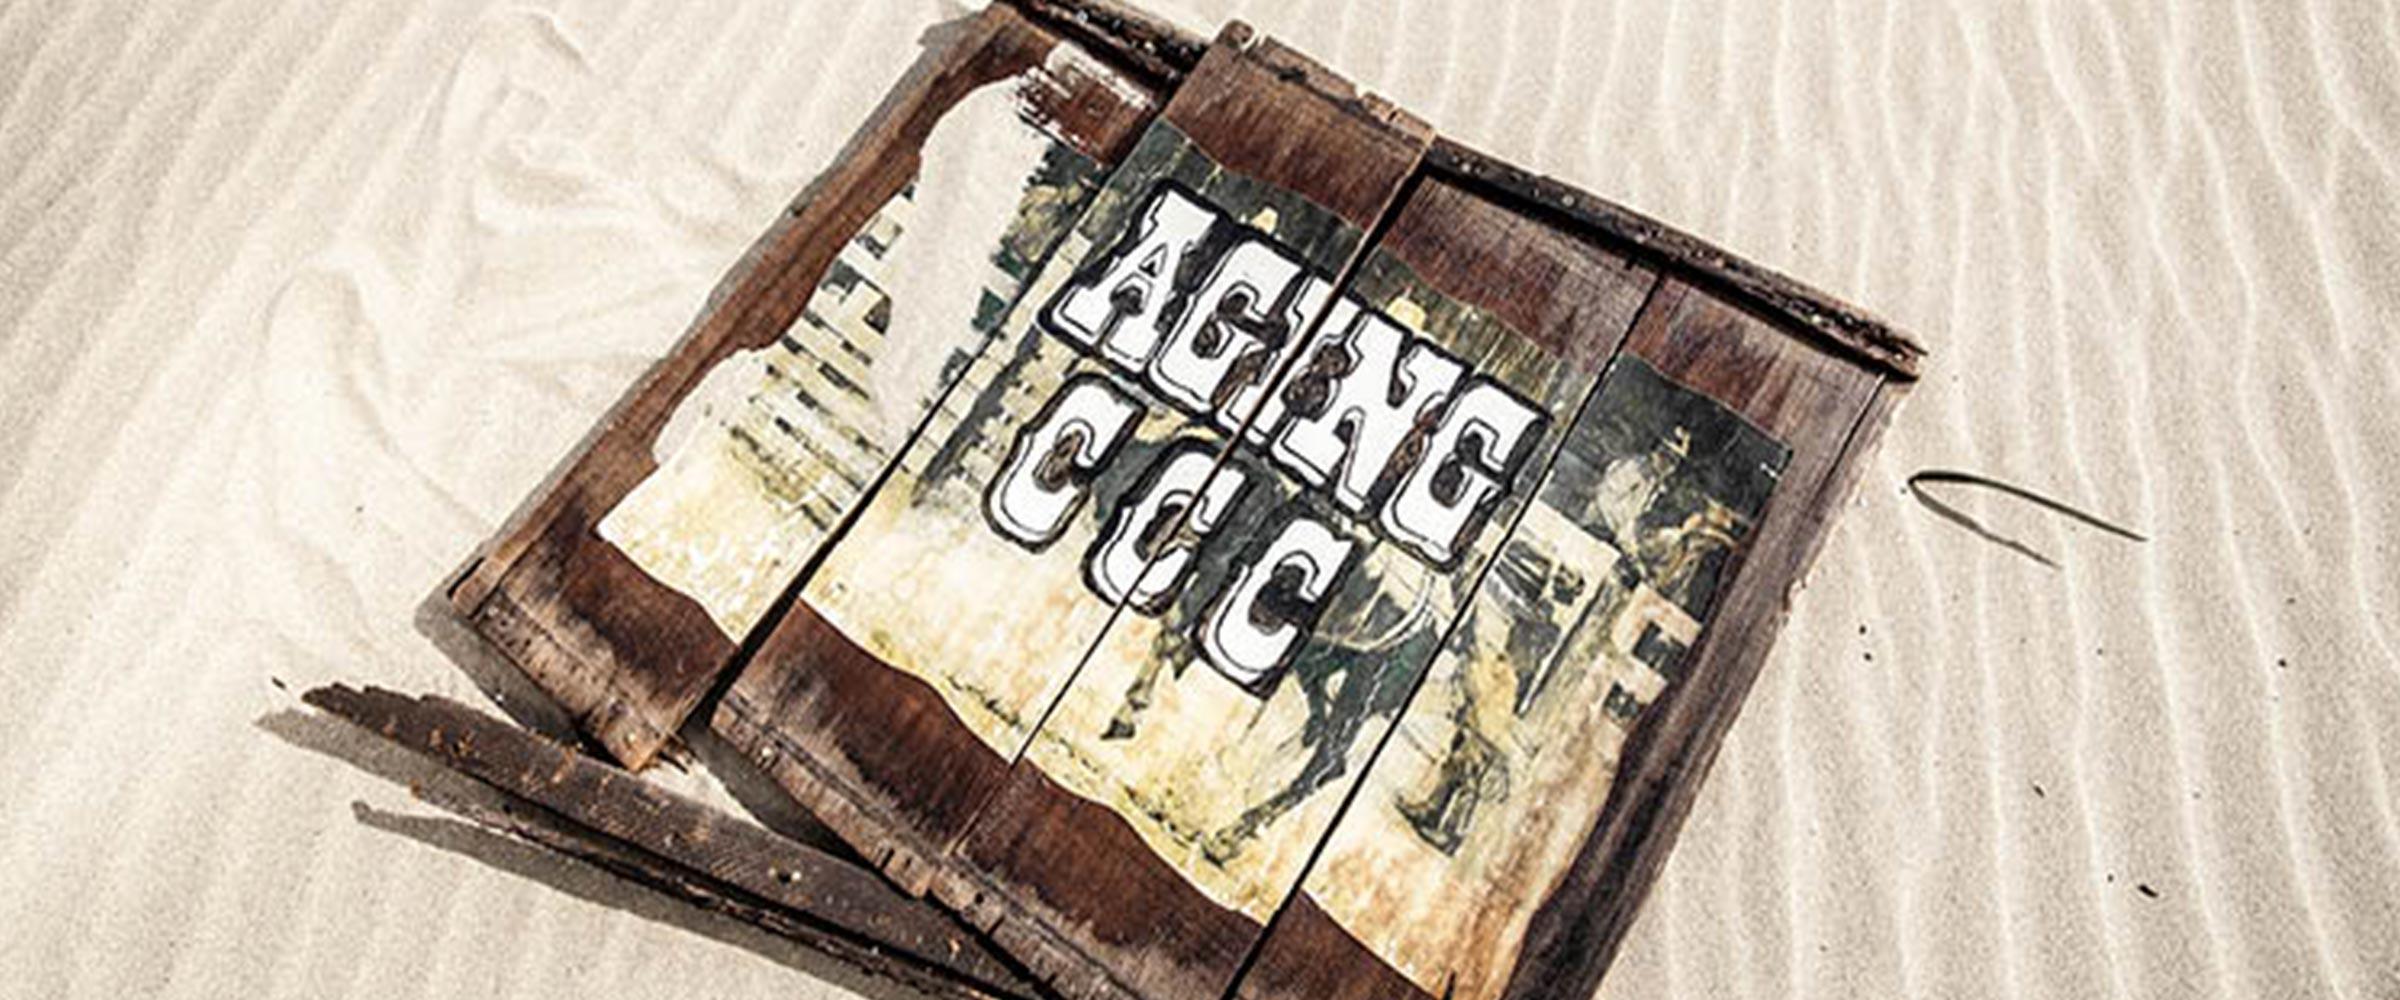 agingccc.jpg